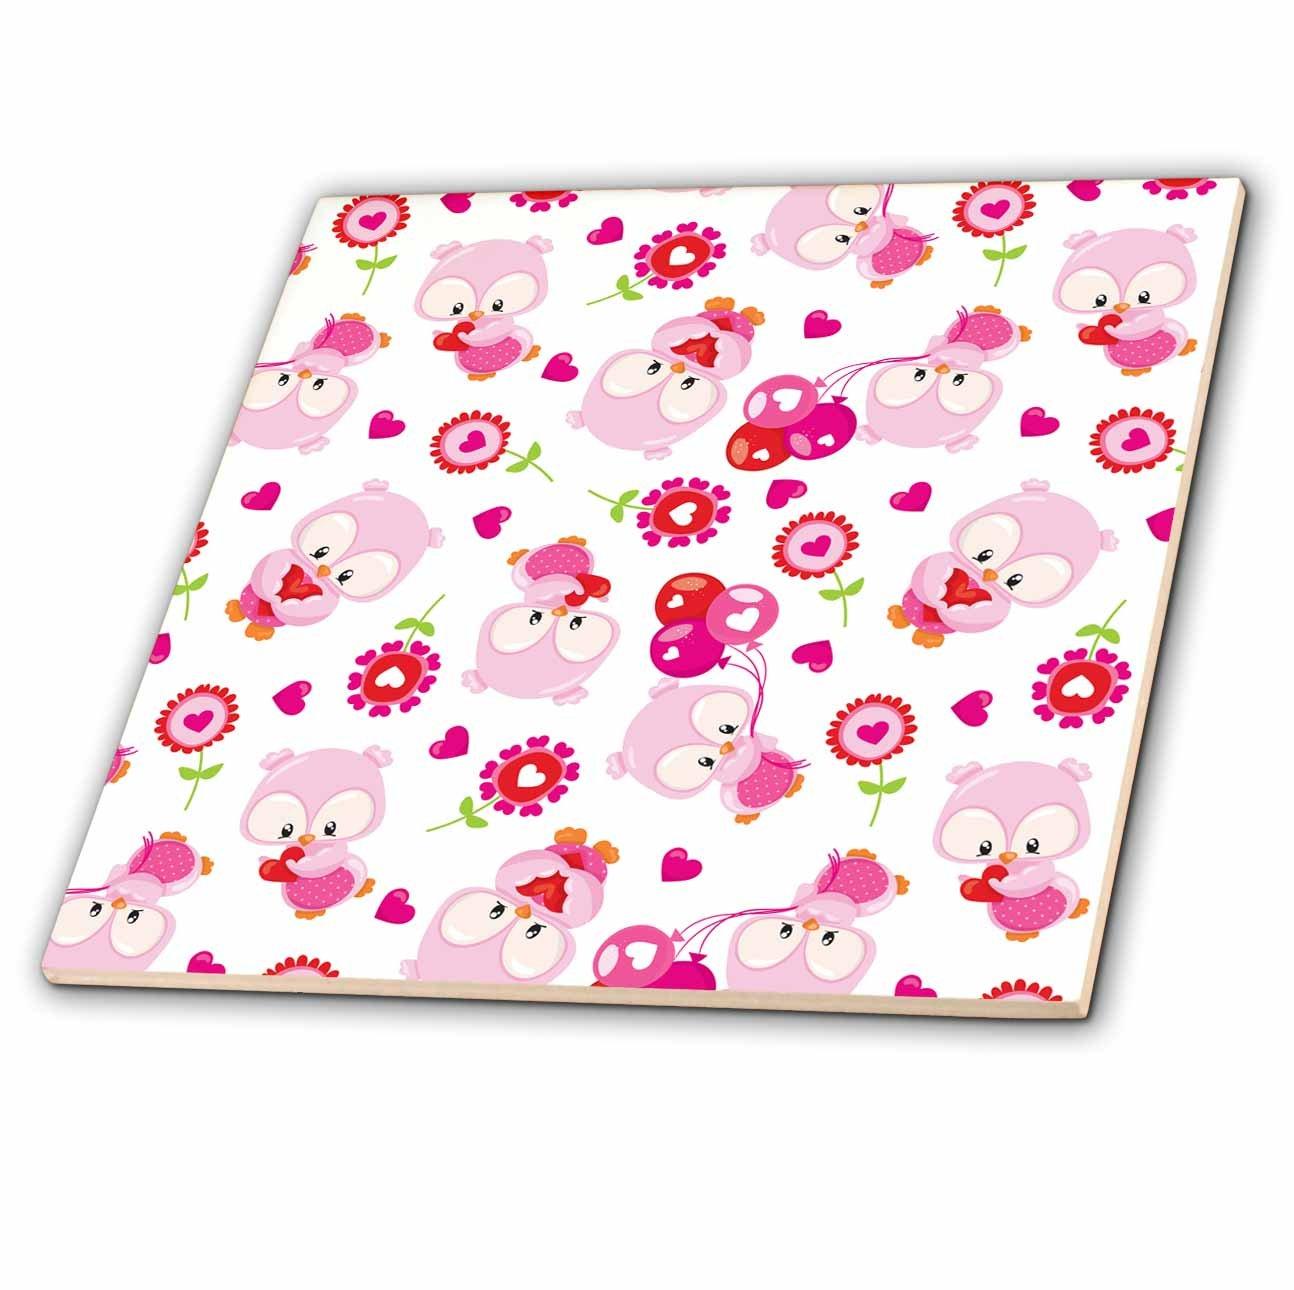 2854261106927 Amazon.com: 3dRose Anne Marie Baugh - Patterns - Cute Light Pink ...